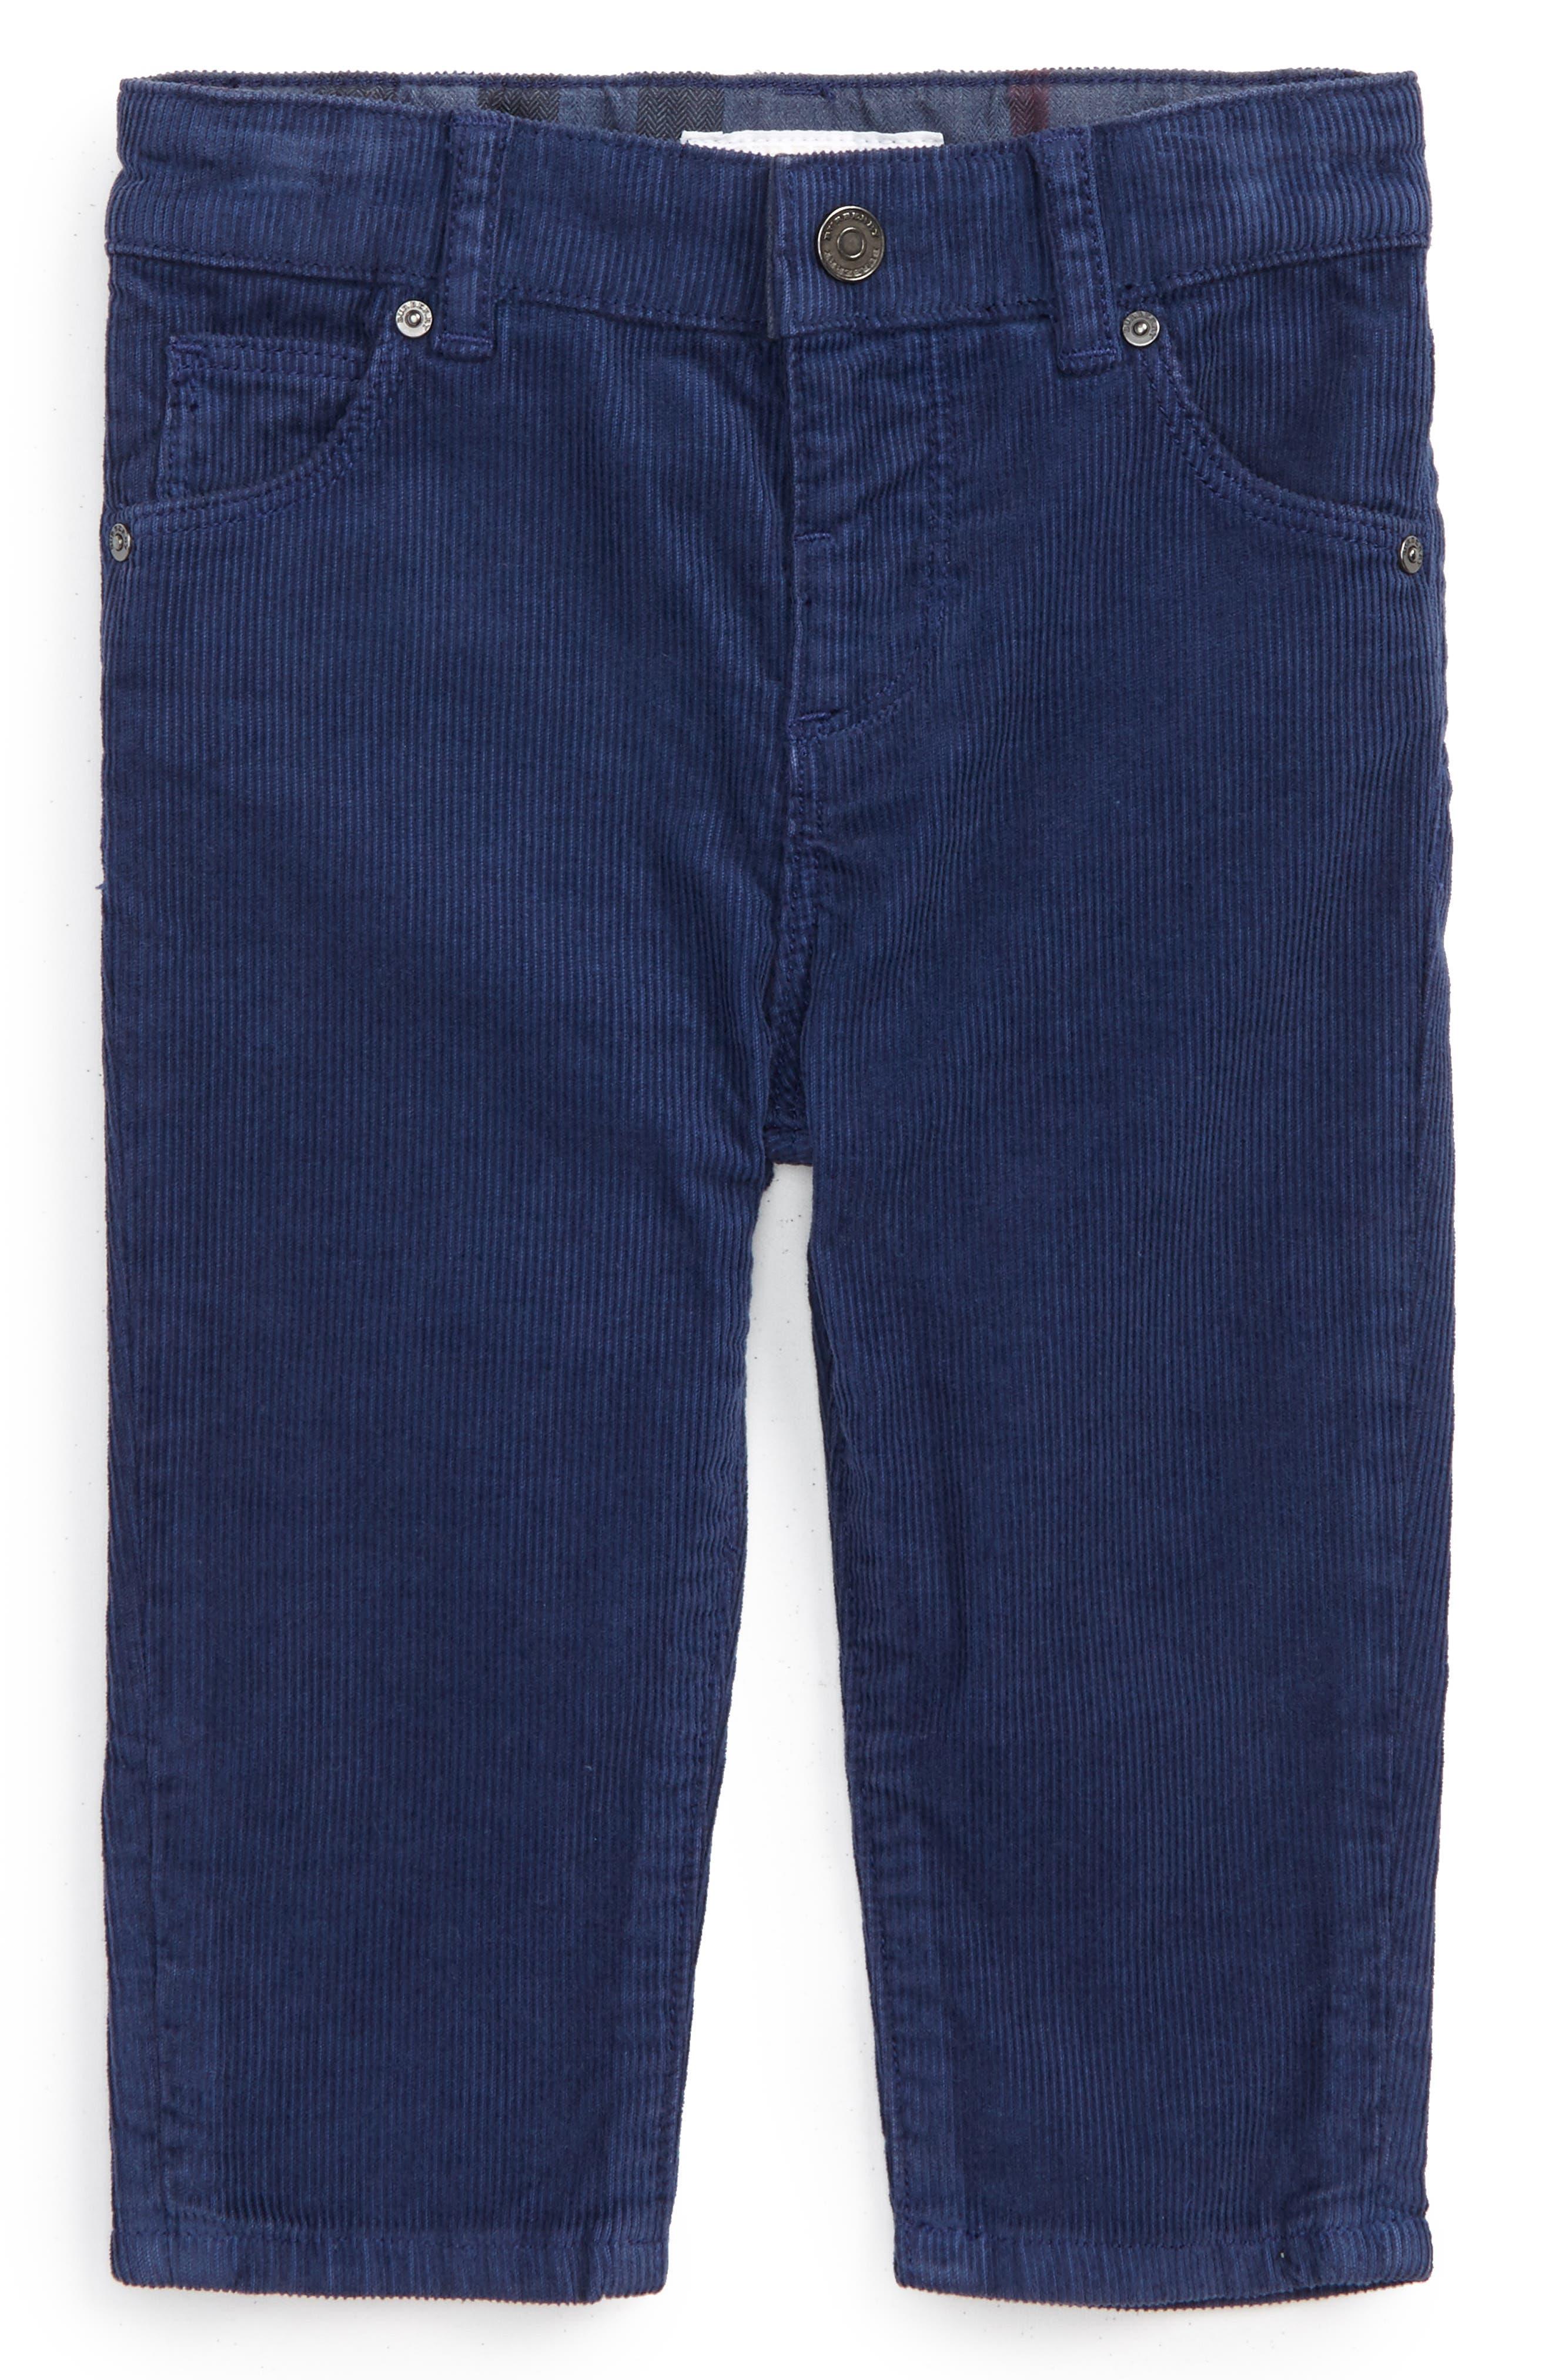 Langston Corduroy Skinny Pants,                         Main,                         color, Blue